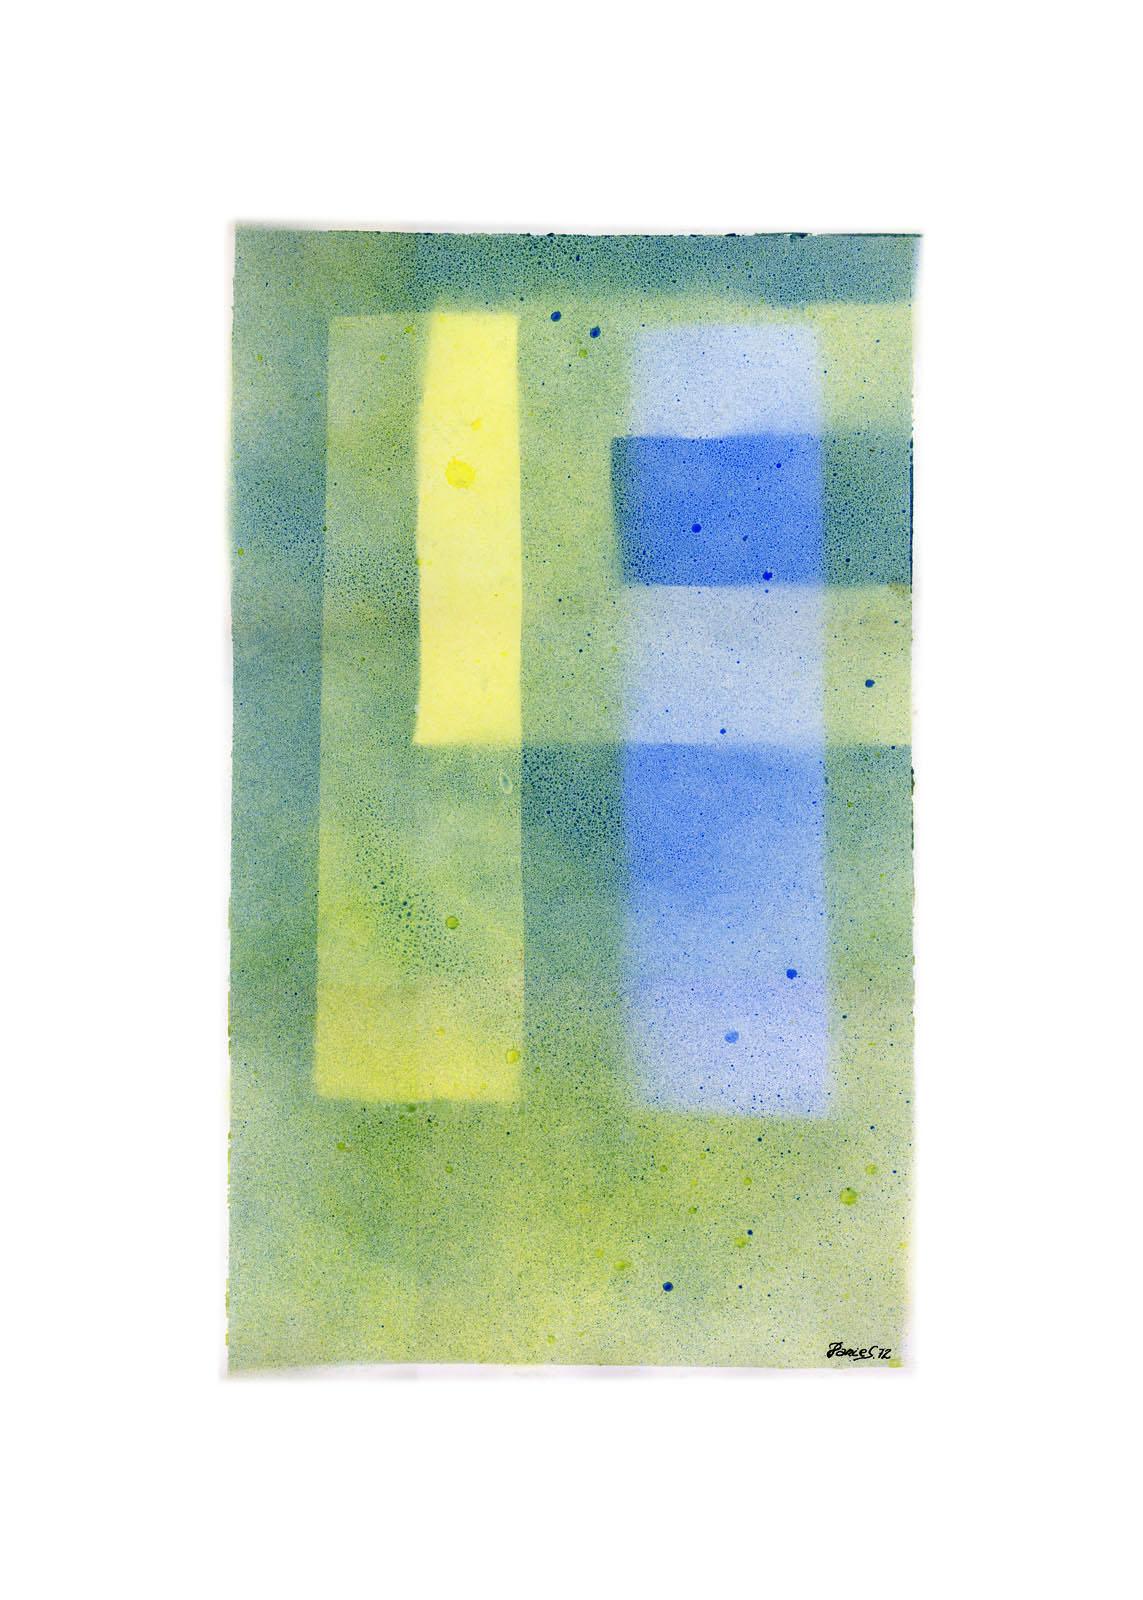 panies-danielvillalobos-spanish-painting-abstract-3